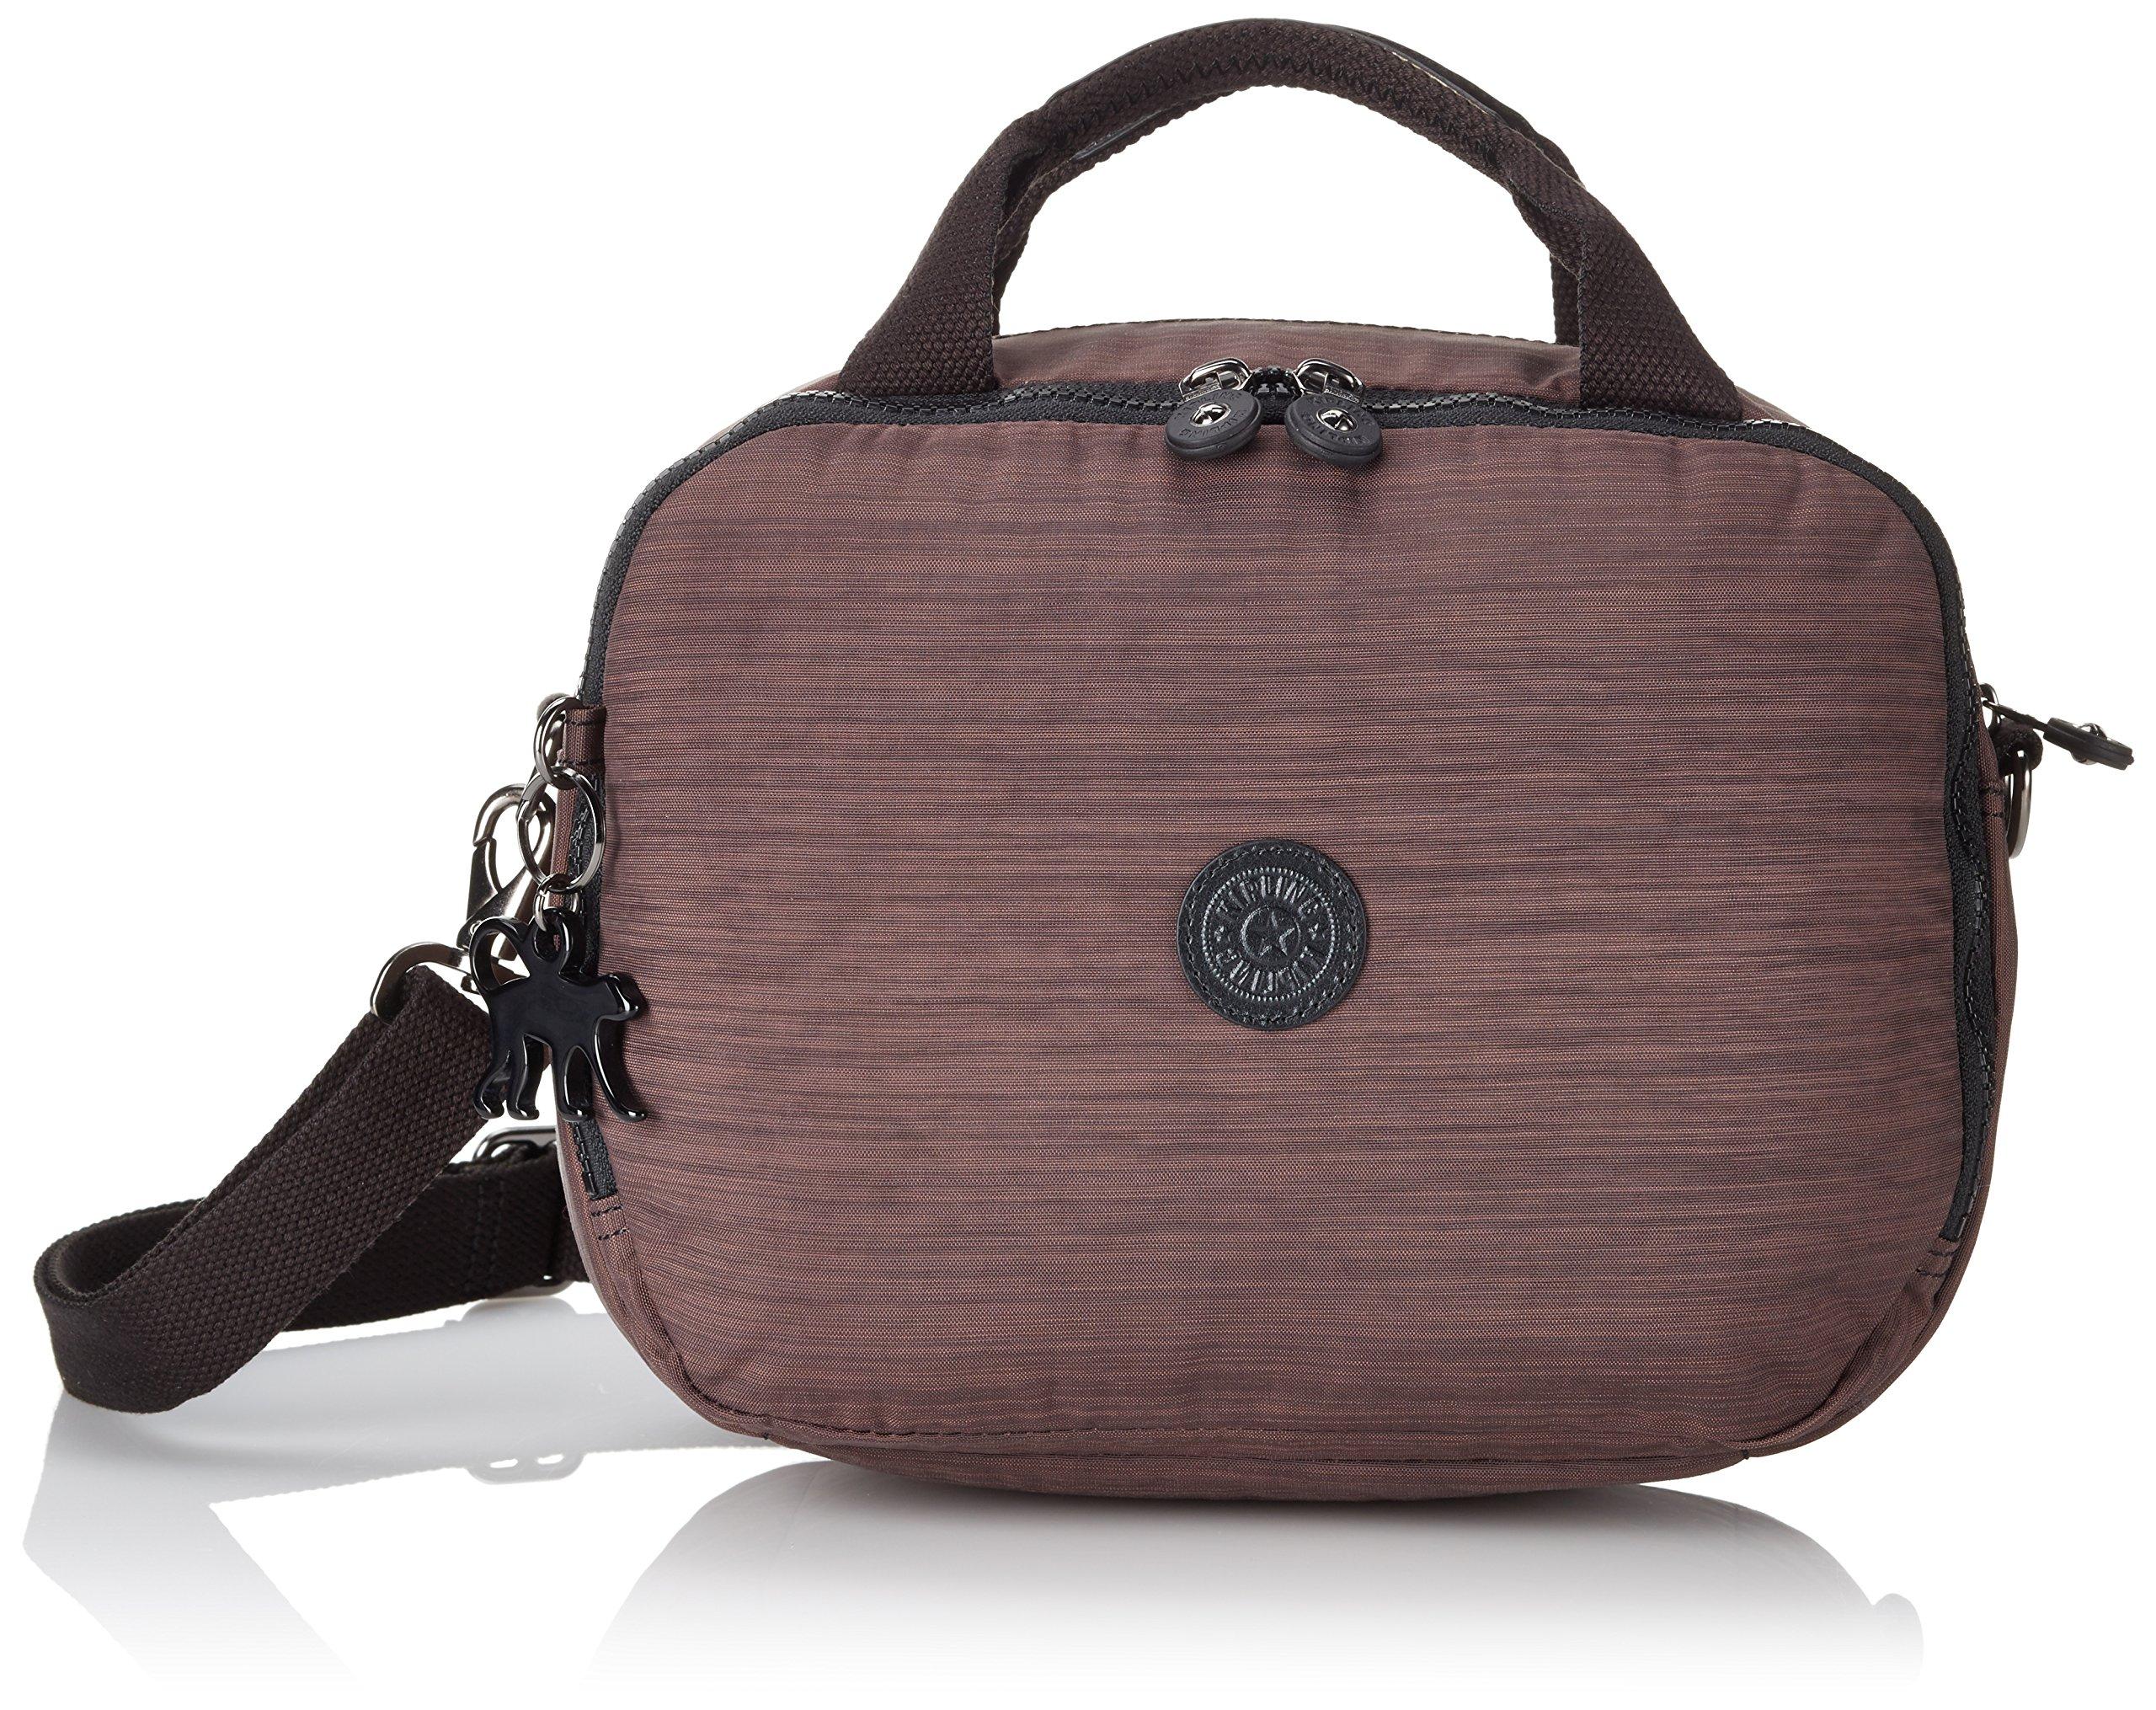 Kipling Women's Bag Organisers - Brown (Dazz Espresso C)